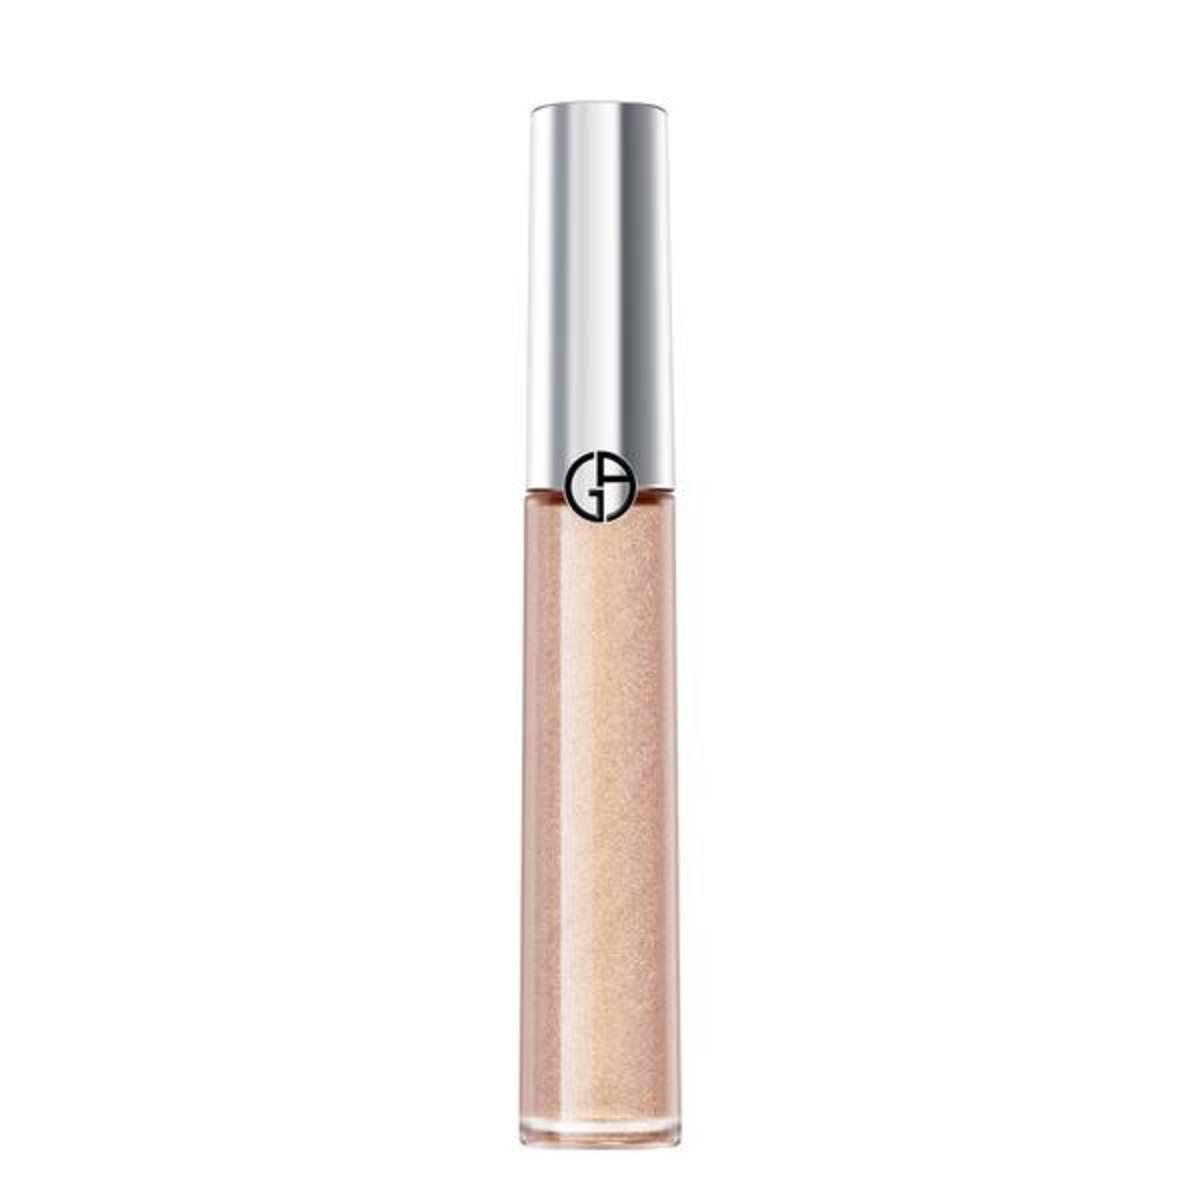 Giorgio Armani Beauty Eye Tint Liquid Eye Shadow in 12 Golden Ashes, $39, available here. Photo: Courtesy of Giorgio Armani Beauty